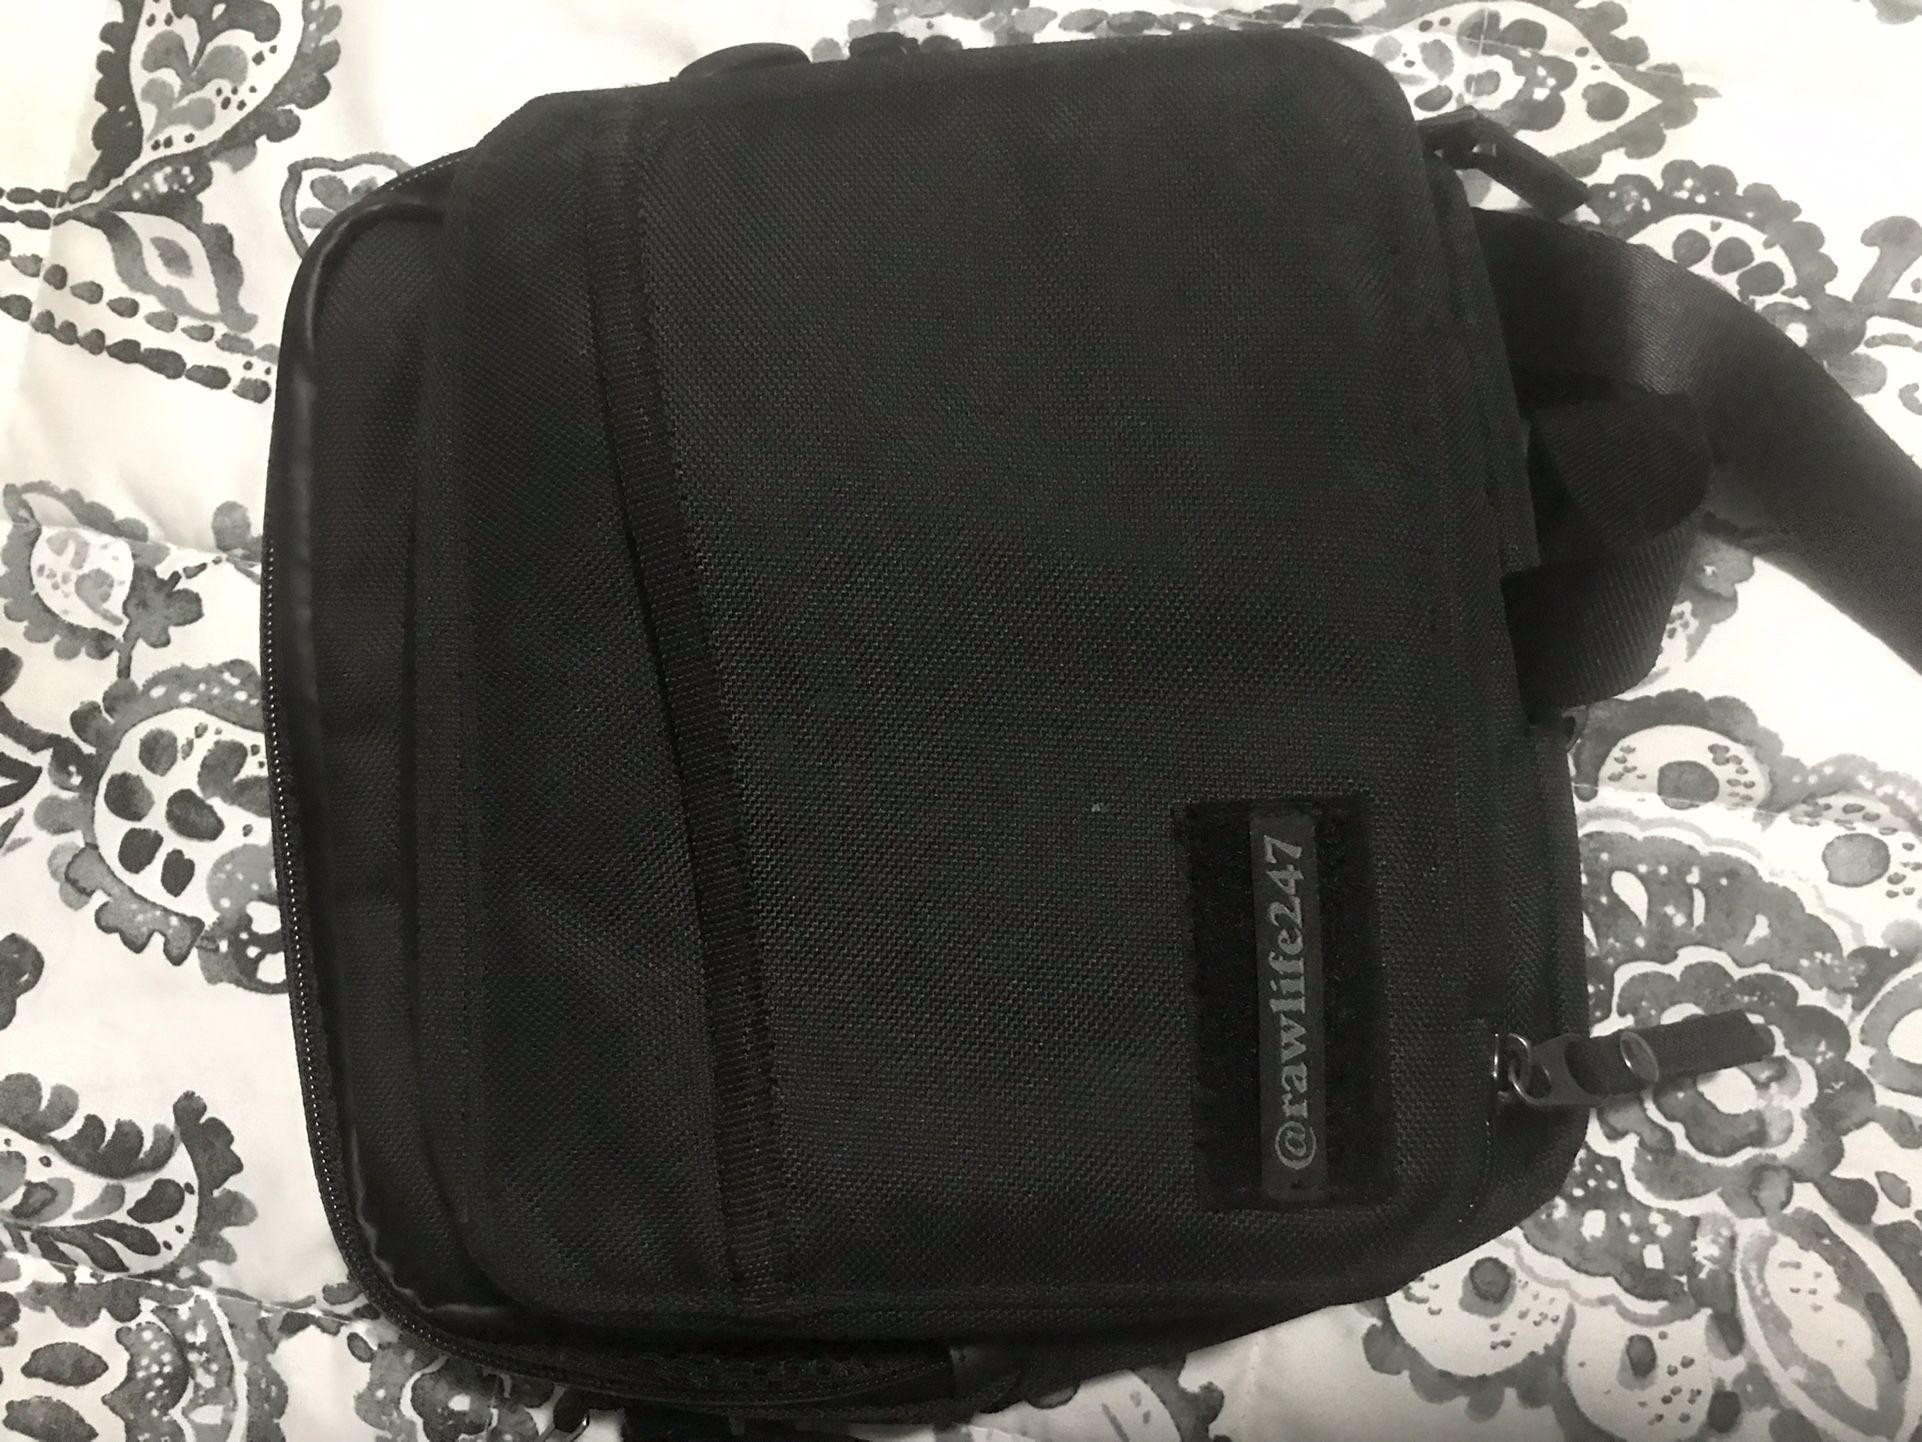 BRAND NEW RAW BAG